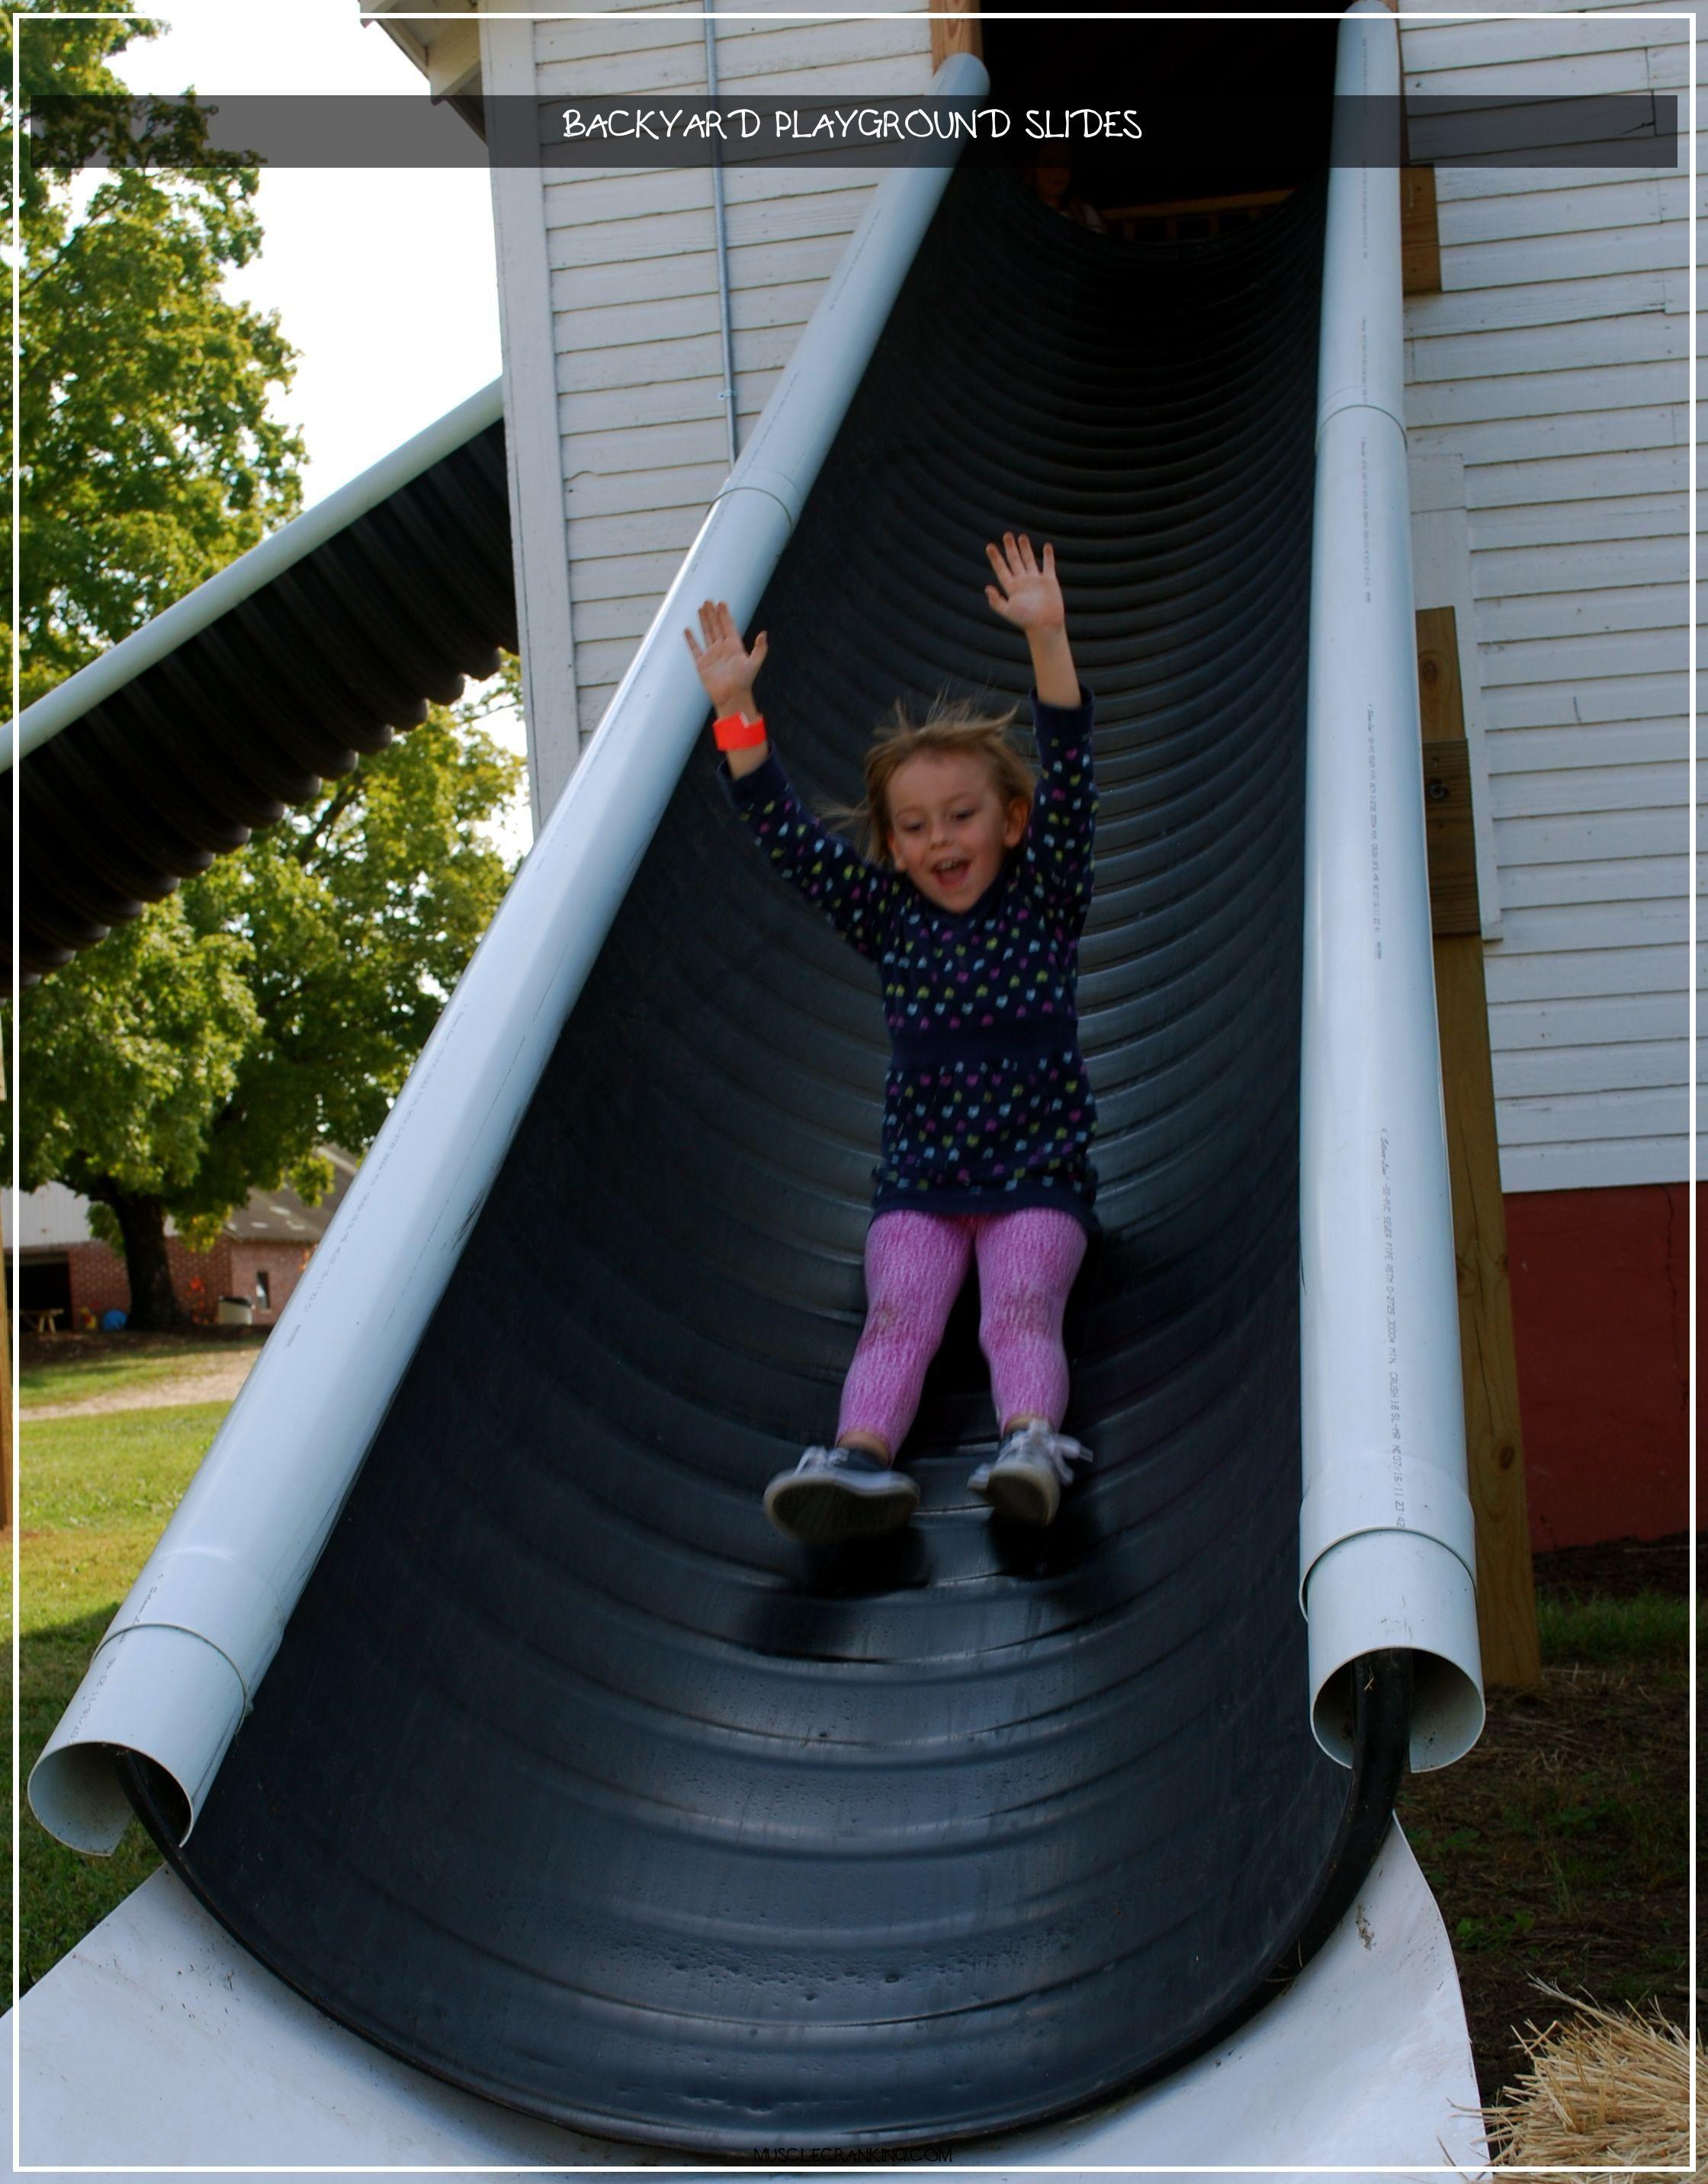 Backyard playground slides 2020 in 2020 backyard slide